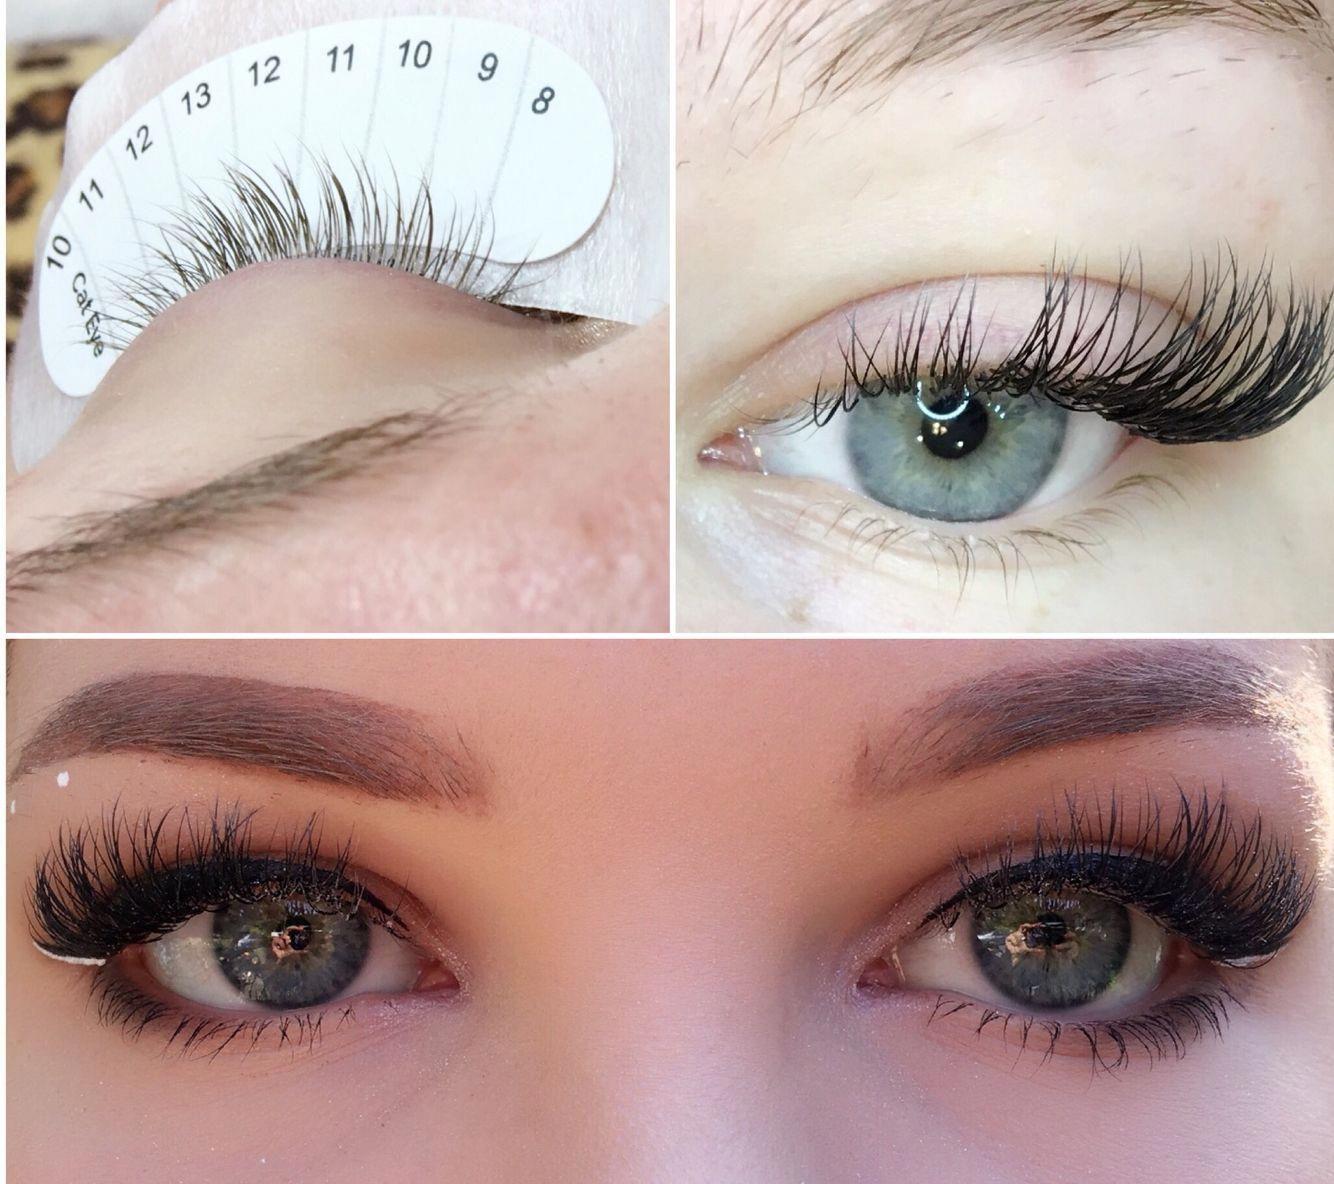 Beauty Essentials Real 3d Mink Soft Long Natural Eye Lashes Makeup Thick False Eyelash Extension Wimpernverlangerung 3d Mink Eyelashes Pestanas Modern And Elegant In Fashion Beauty & Health